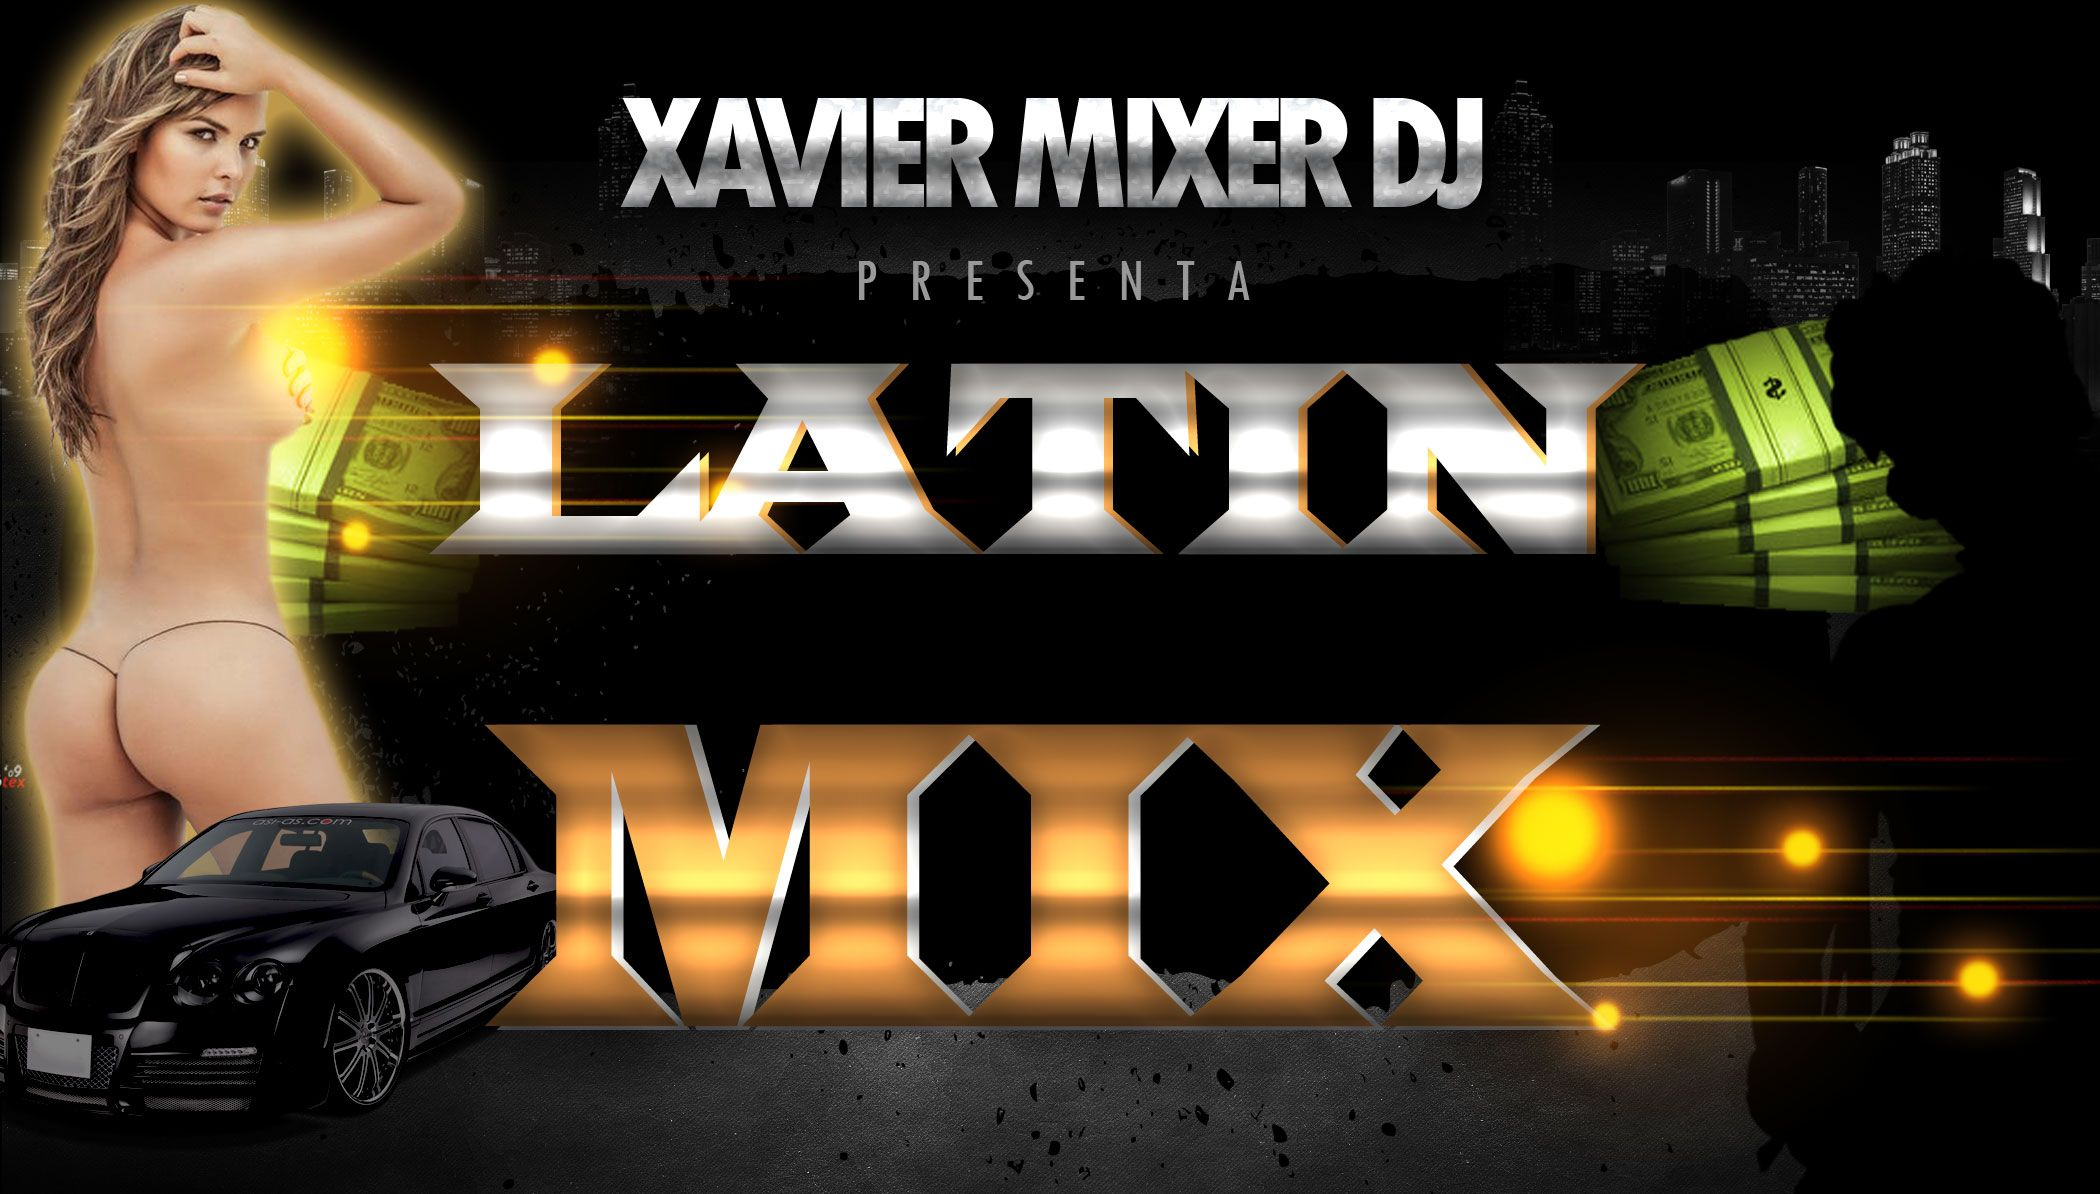 Descargar Latin Mix 2013 - Xavier Mixer Dj free | PACK REMIX INTROS CUMBIAS DJ CHICHO | My Zona DJ Premium